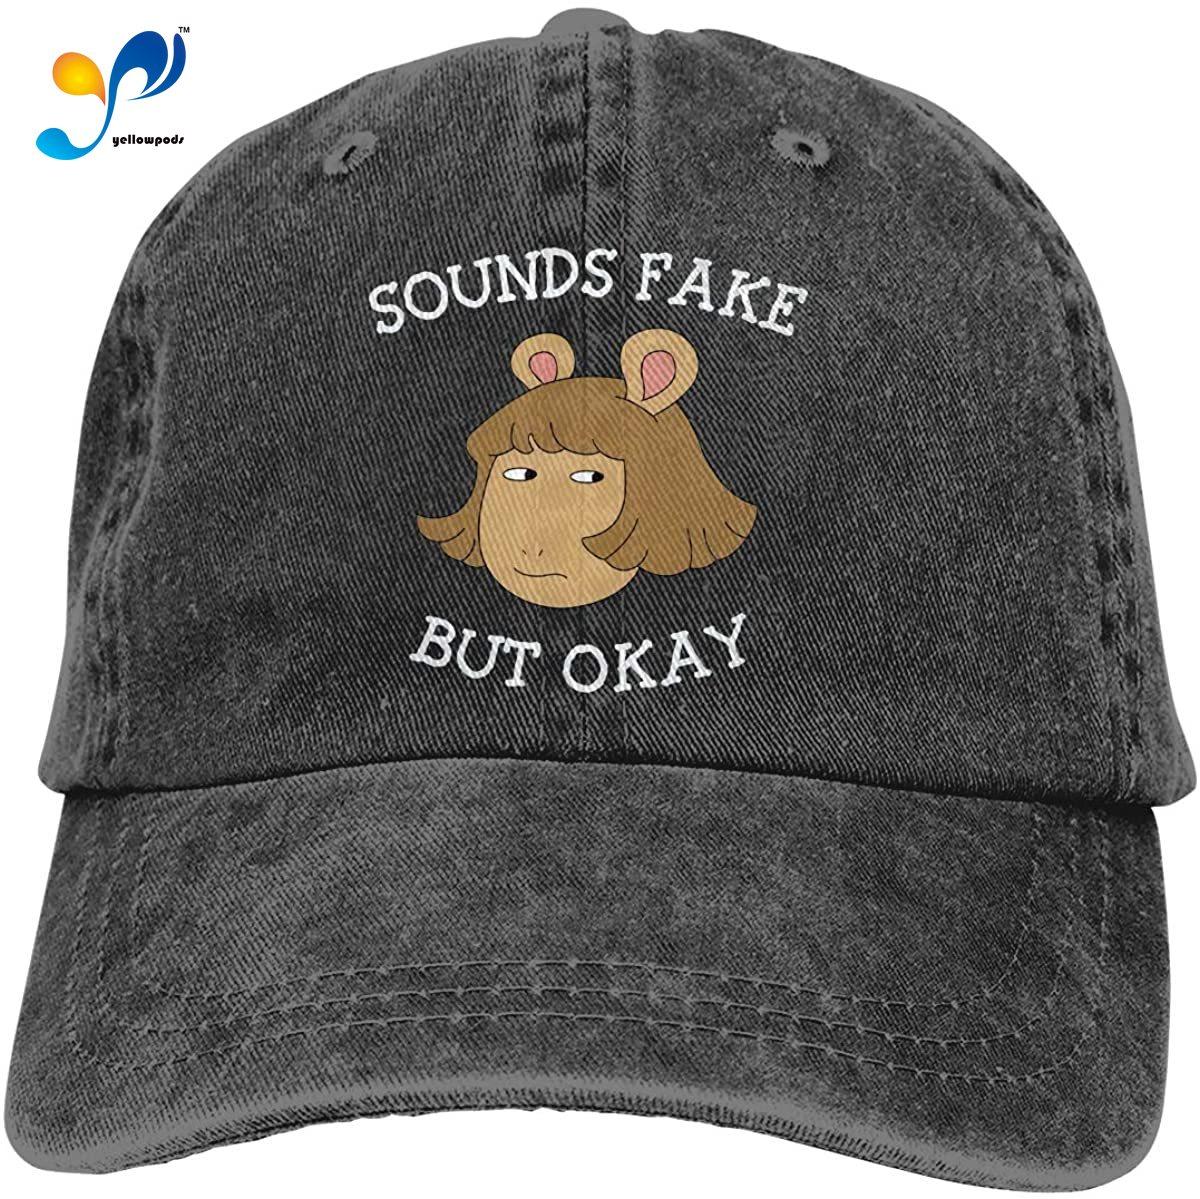 Arthur Sounds Fake But Okay Cowboy Cap Baseball Hat Casquette Headgear